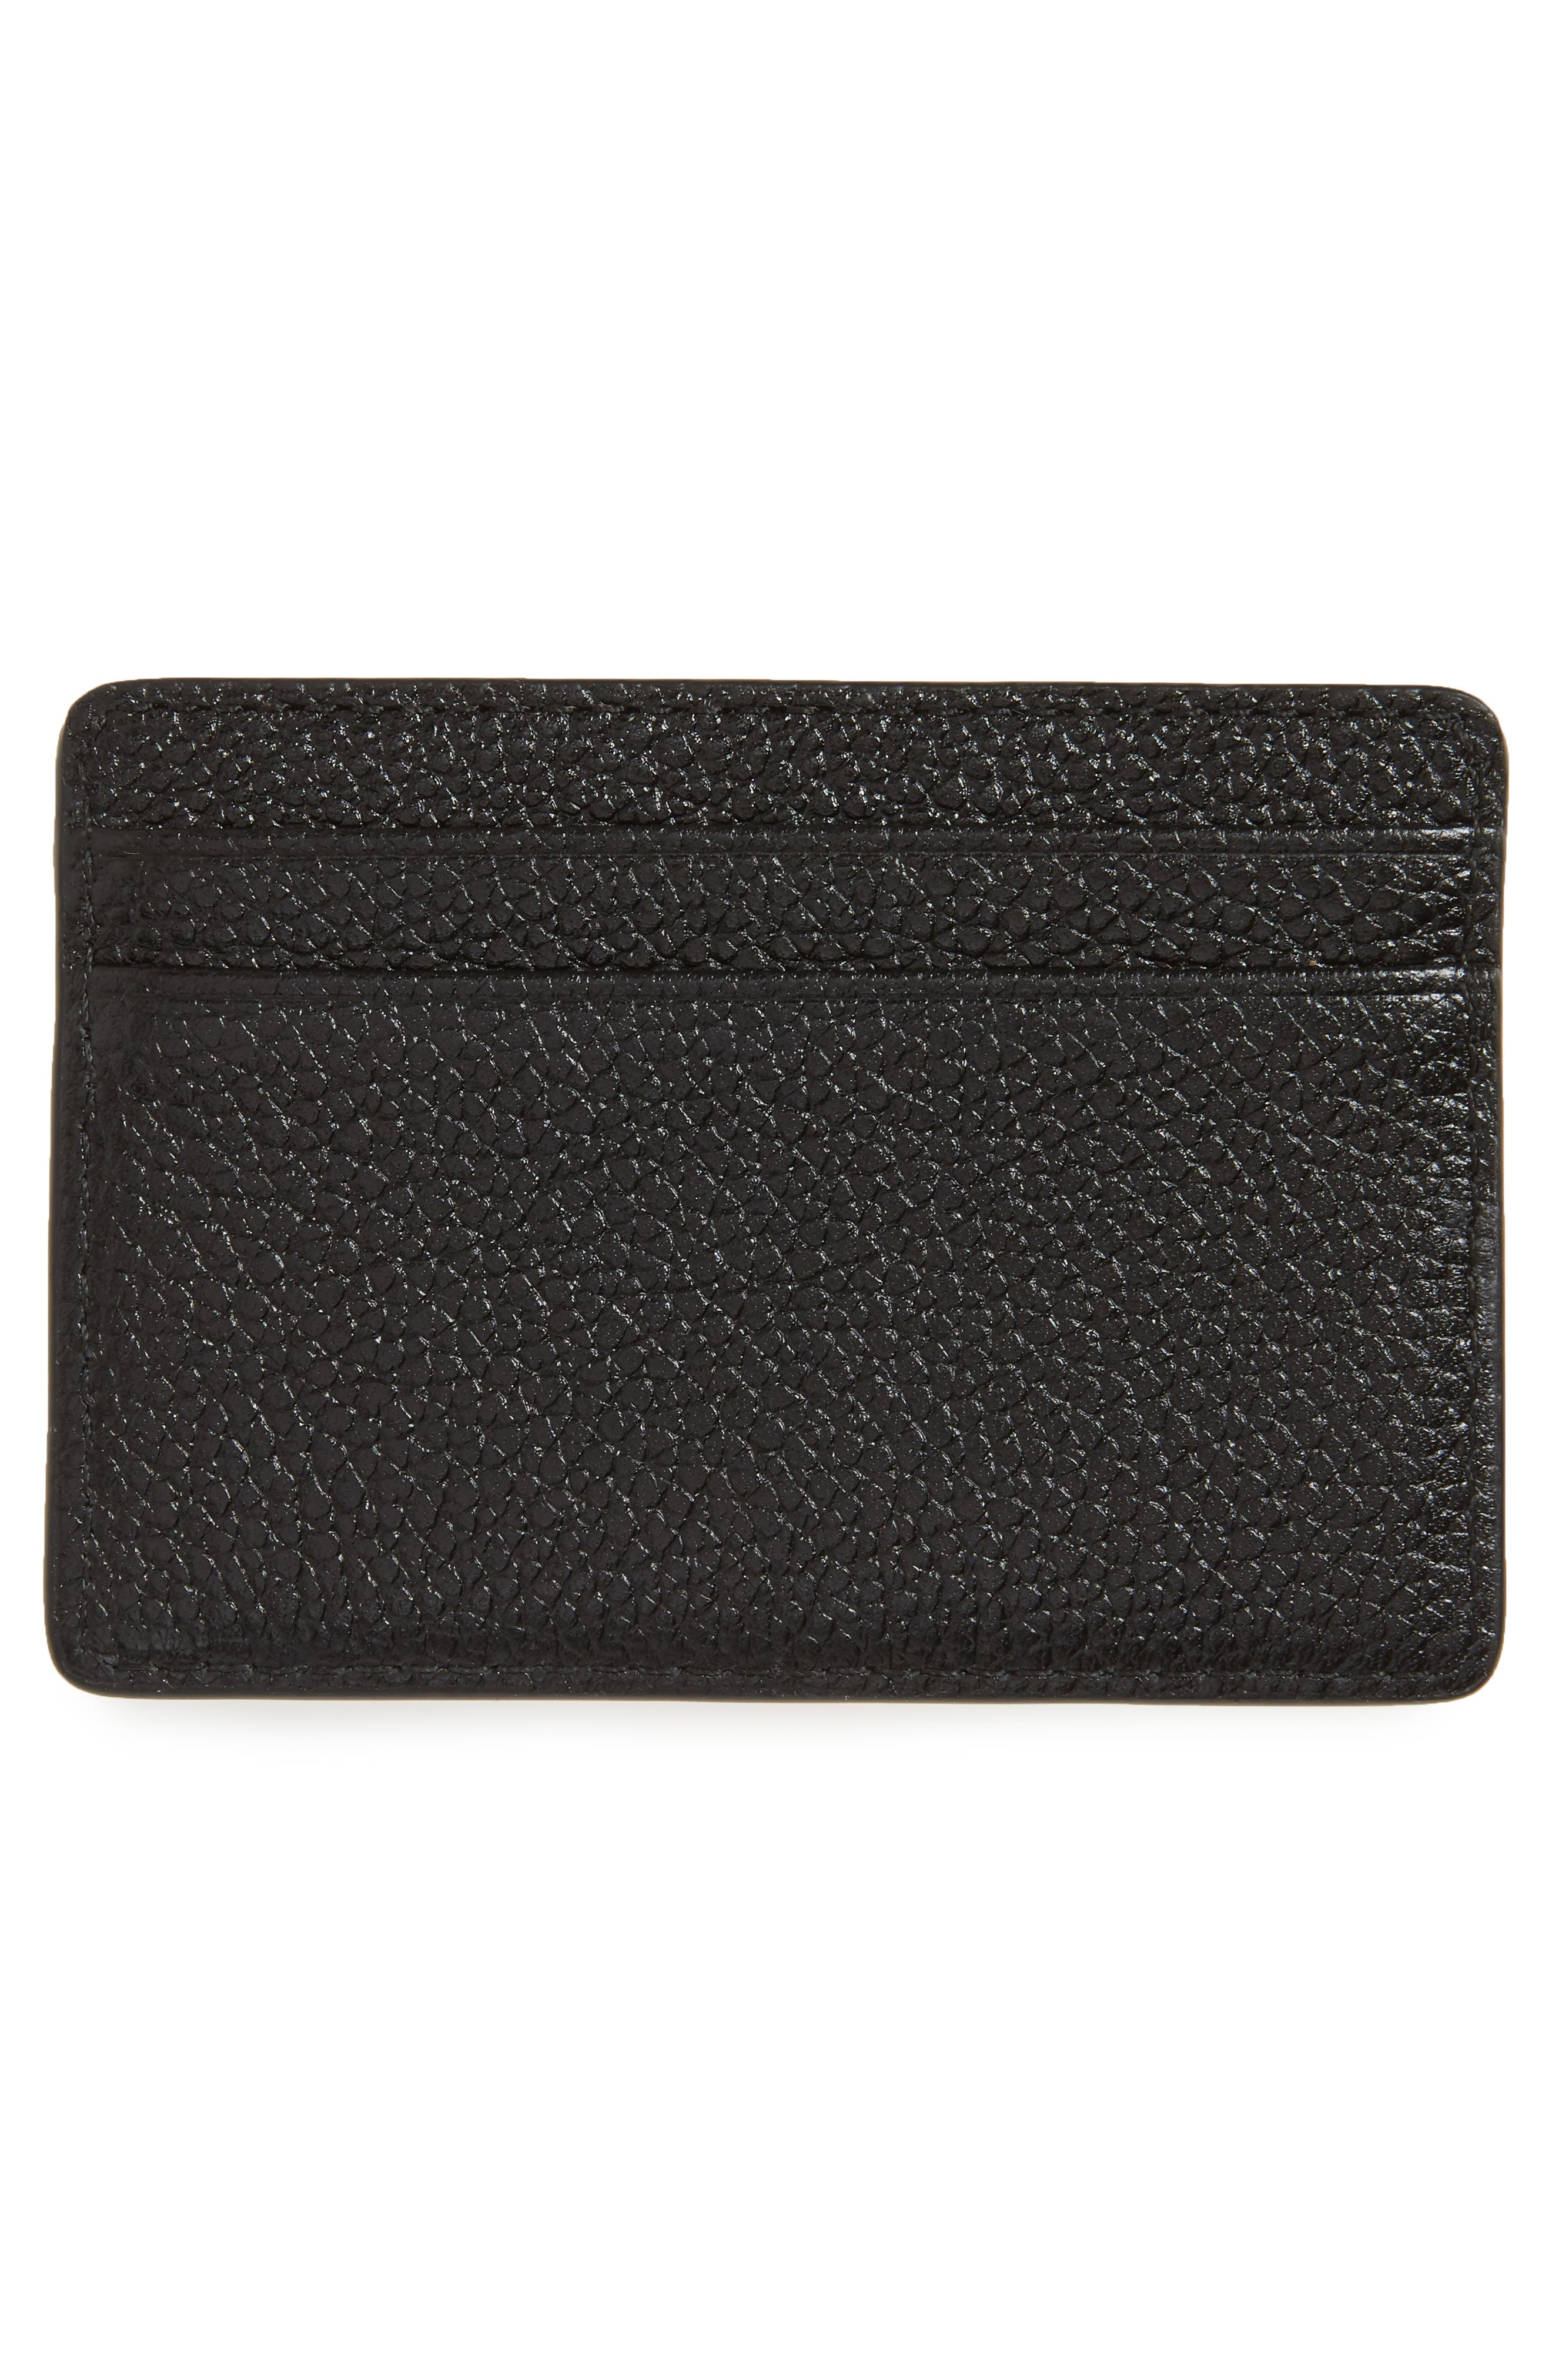 Money Pieces Leather Card Case,                             Alternate thumbnail 2, color,                             001